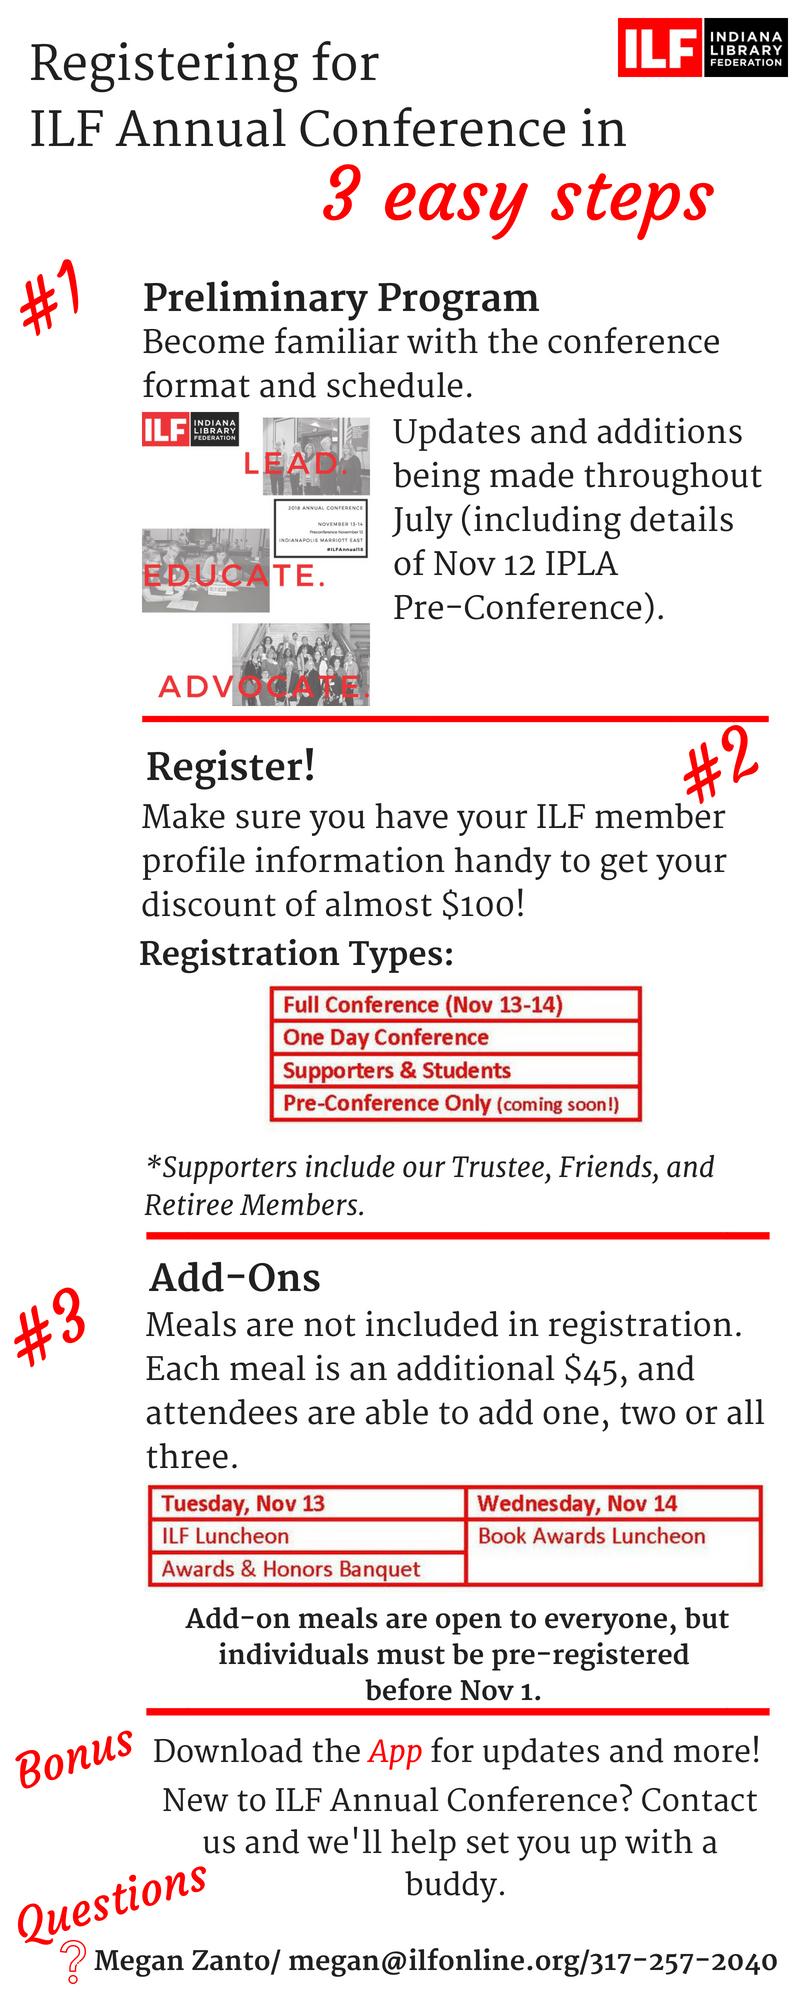 Registering in 3 easy steps